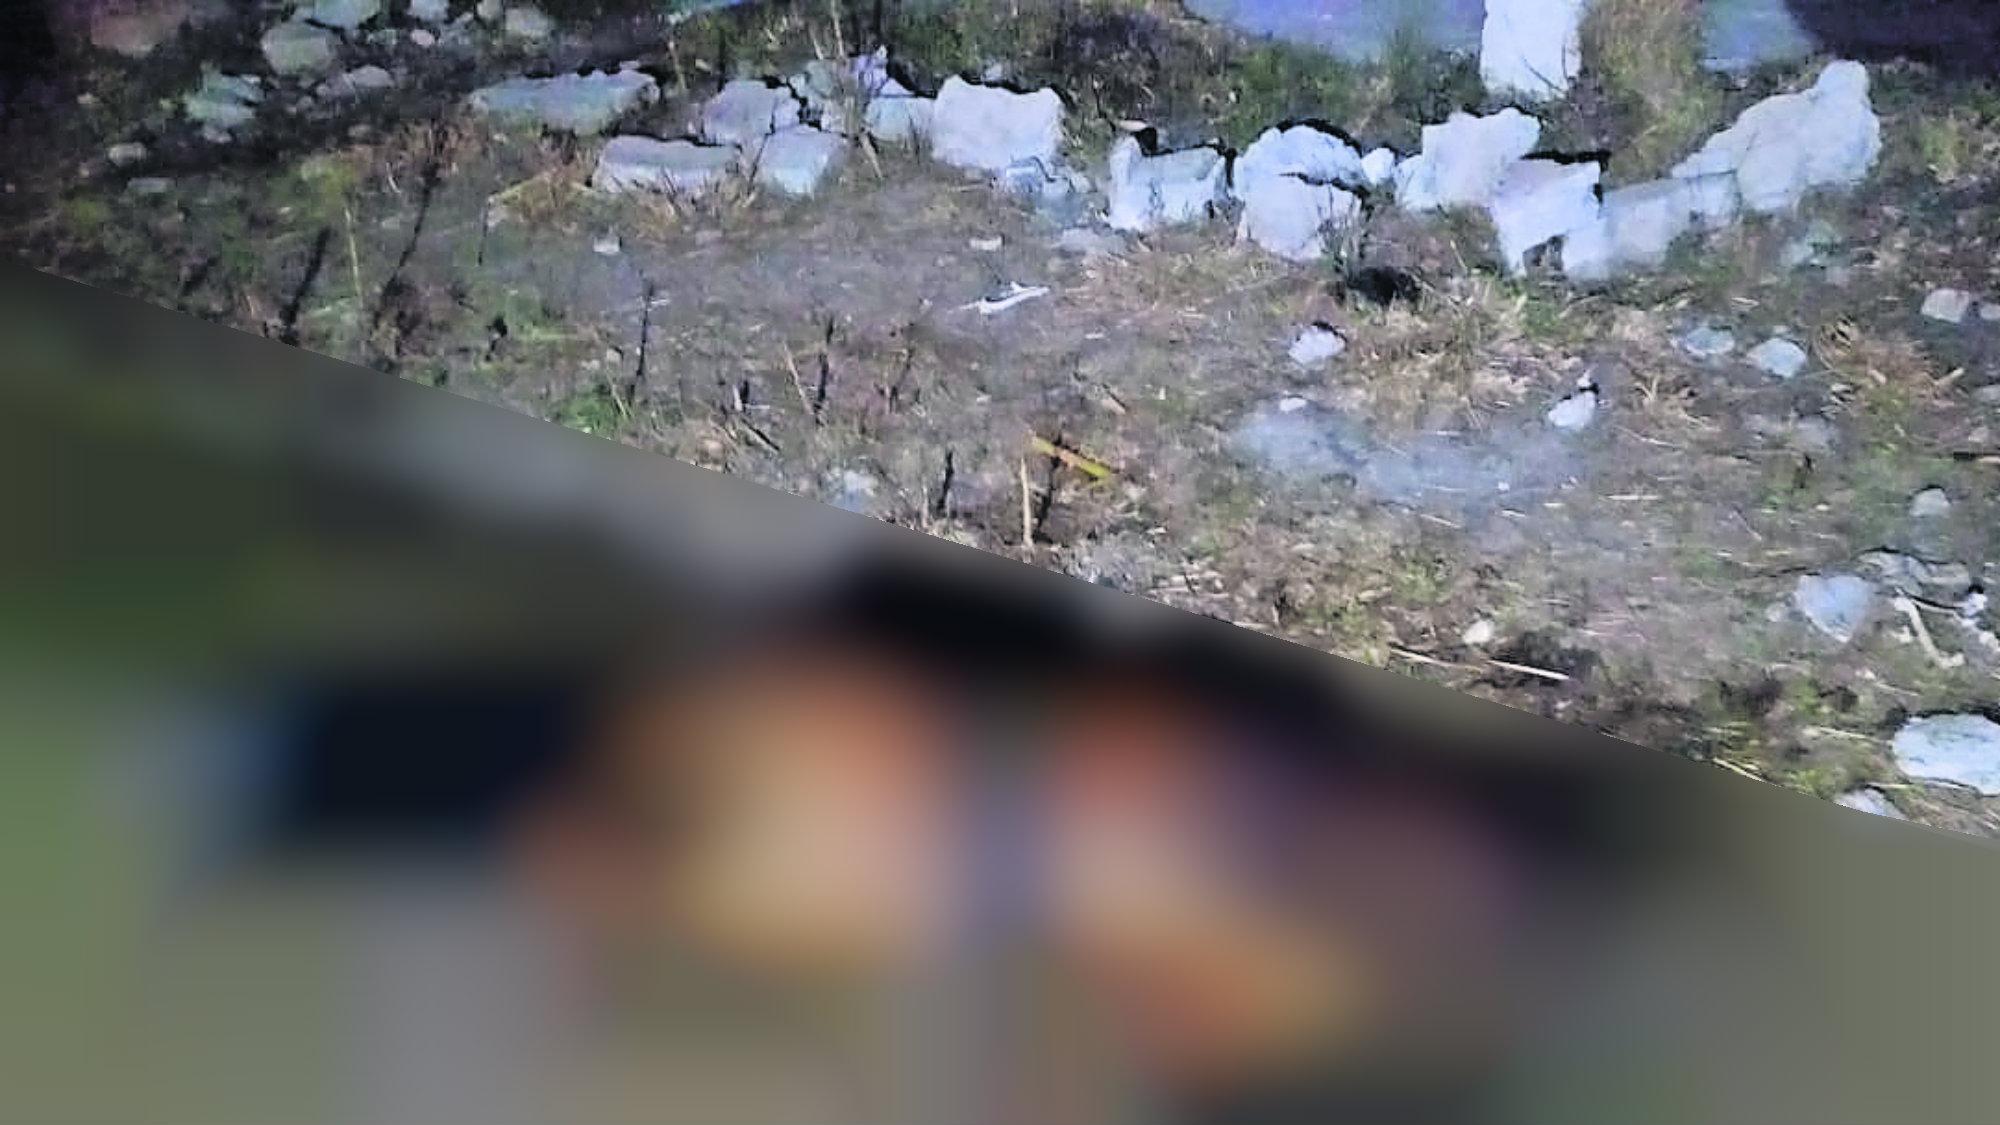 Mujer asesinada Violada Calcinada Temascalapa Edomex Hidalgo